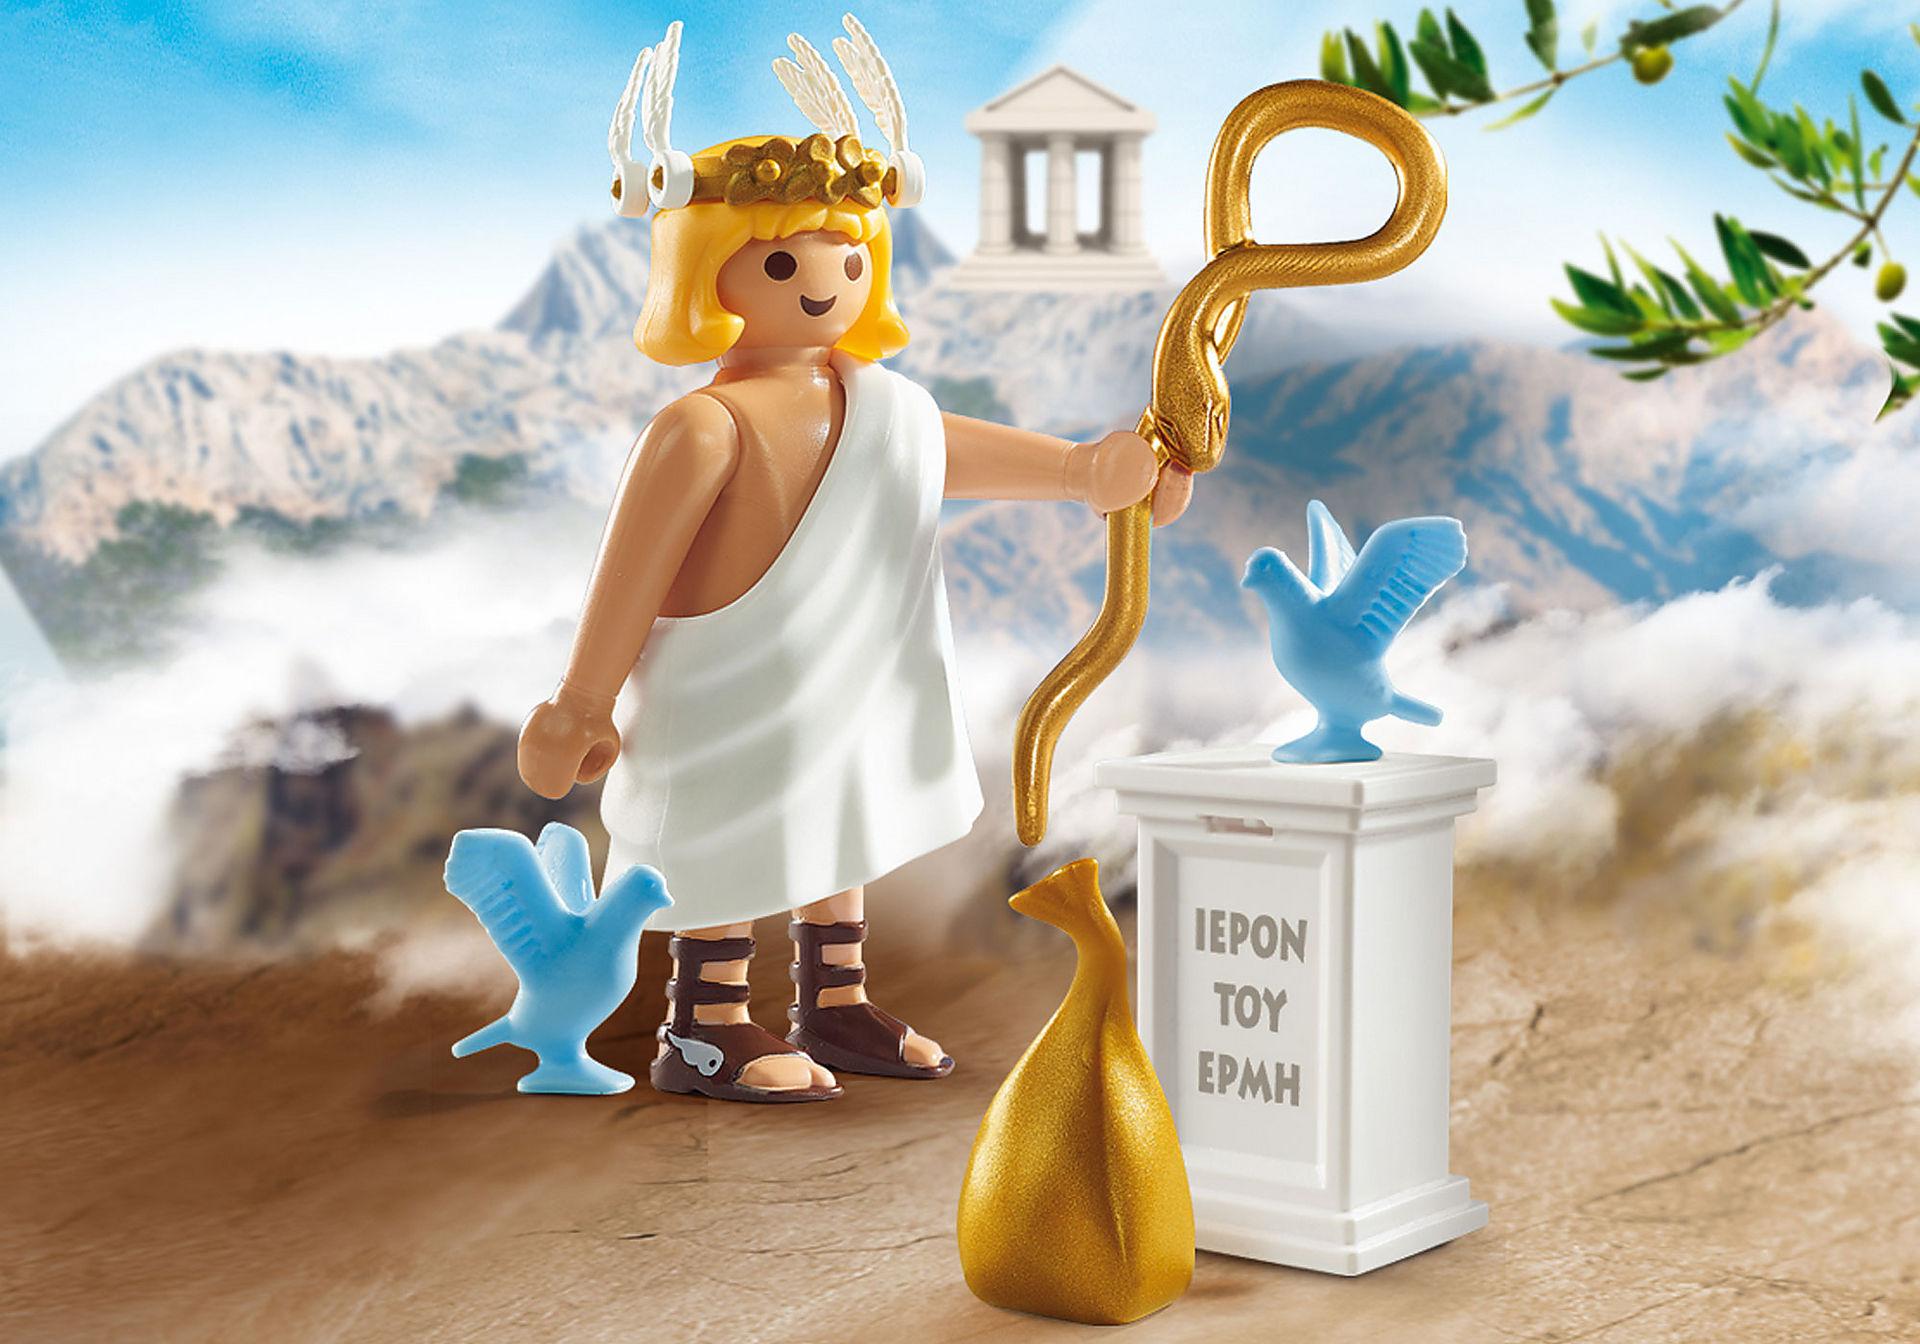 http://media.playmobil.com/i/playmobil/9524_product_detail/Hermes